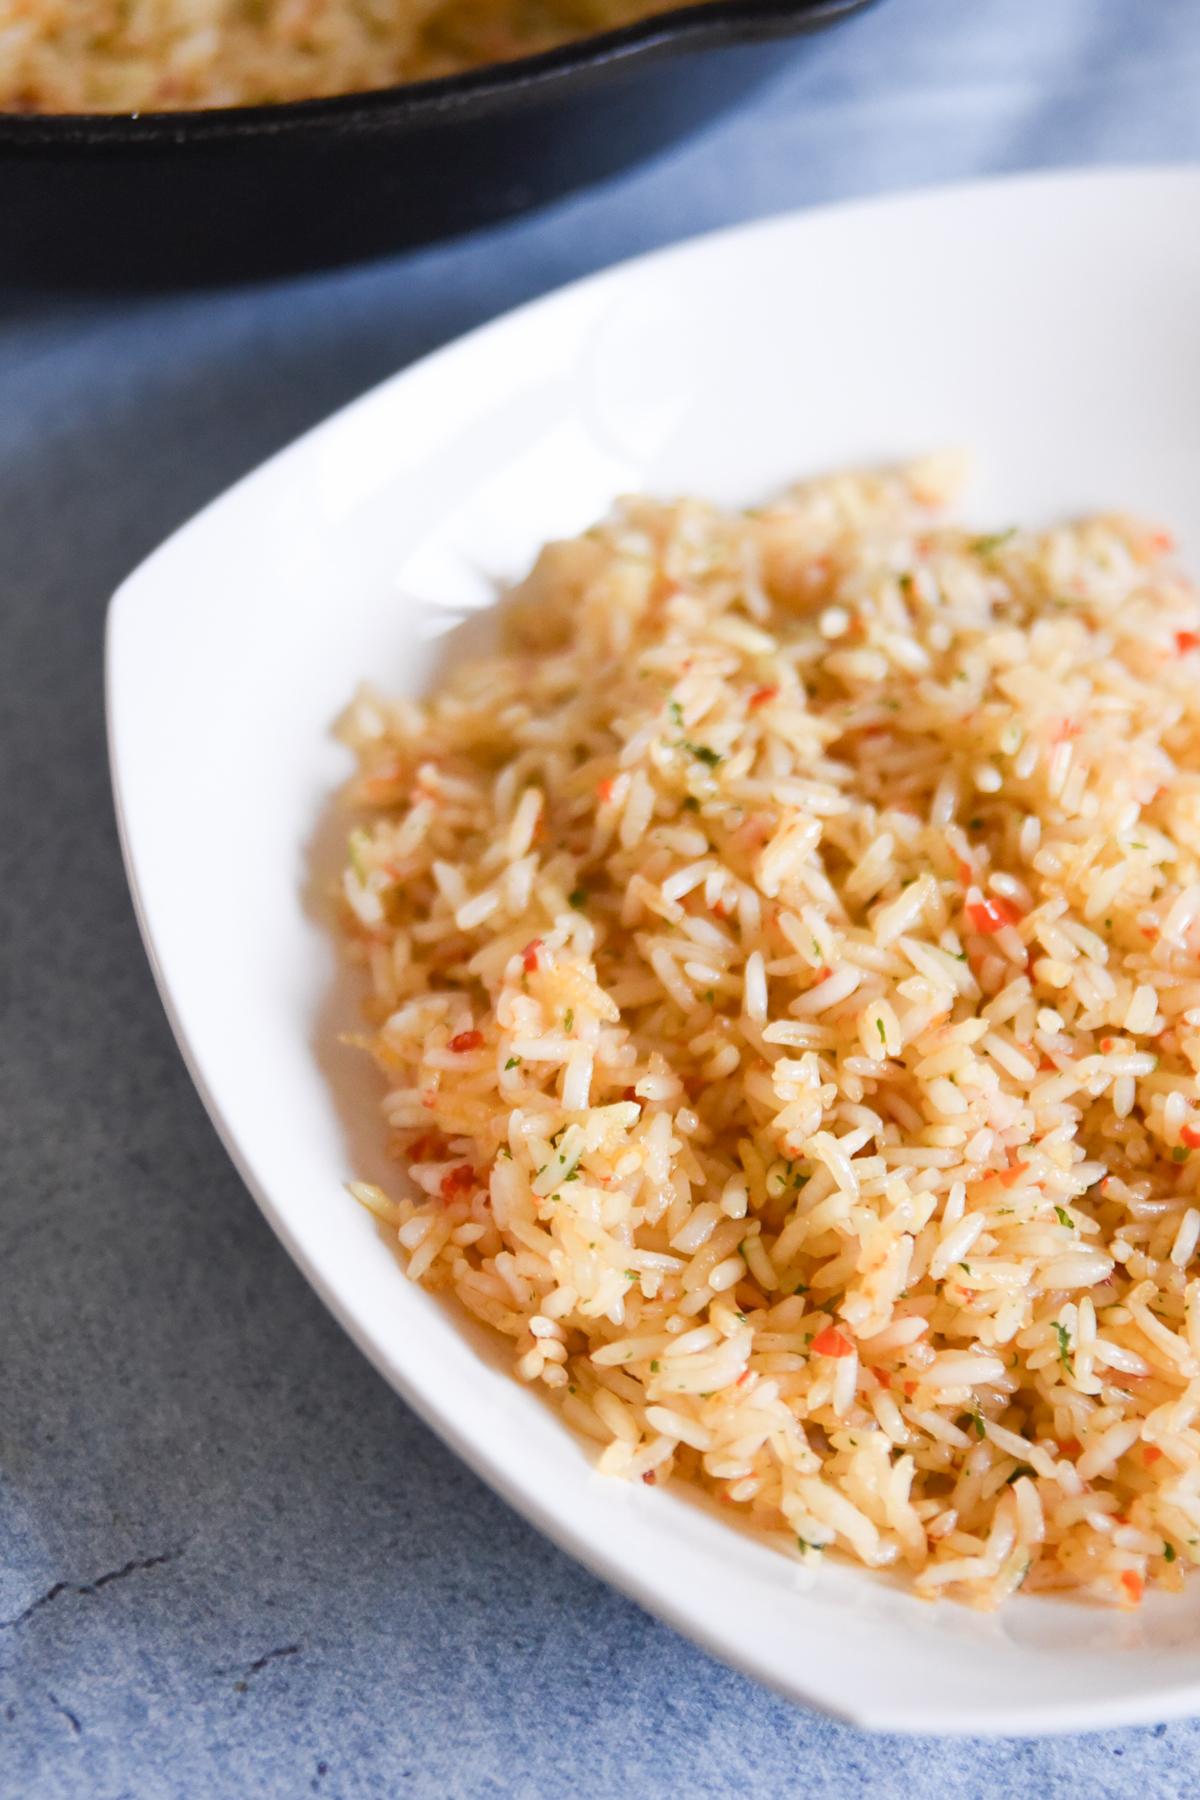 longhorn steakhouse rice pilaf